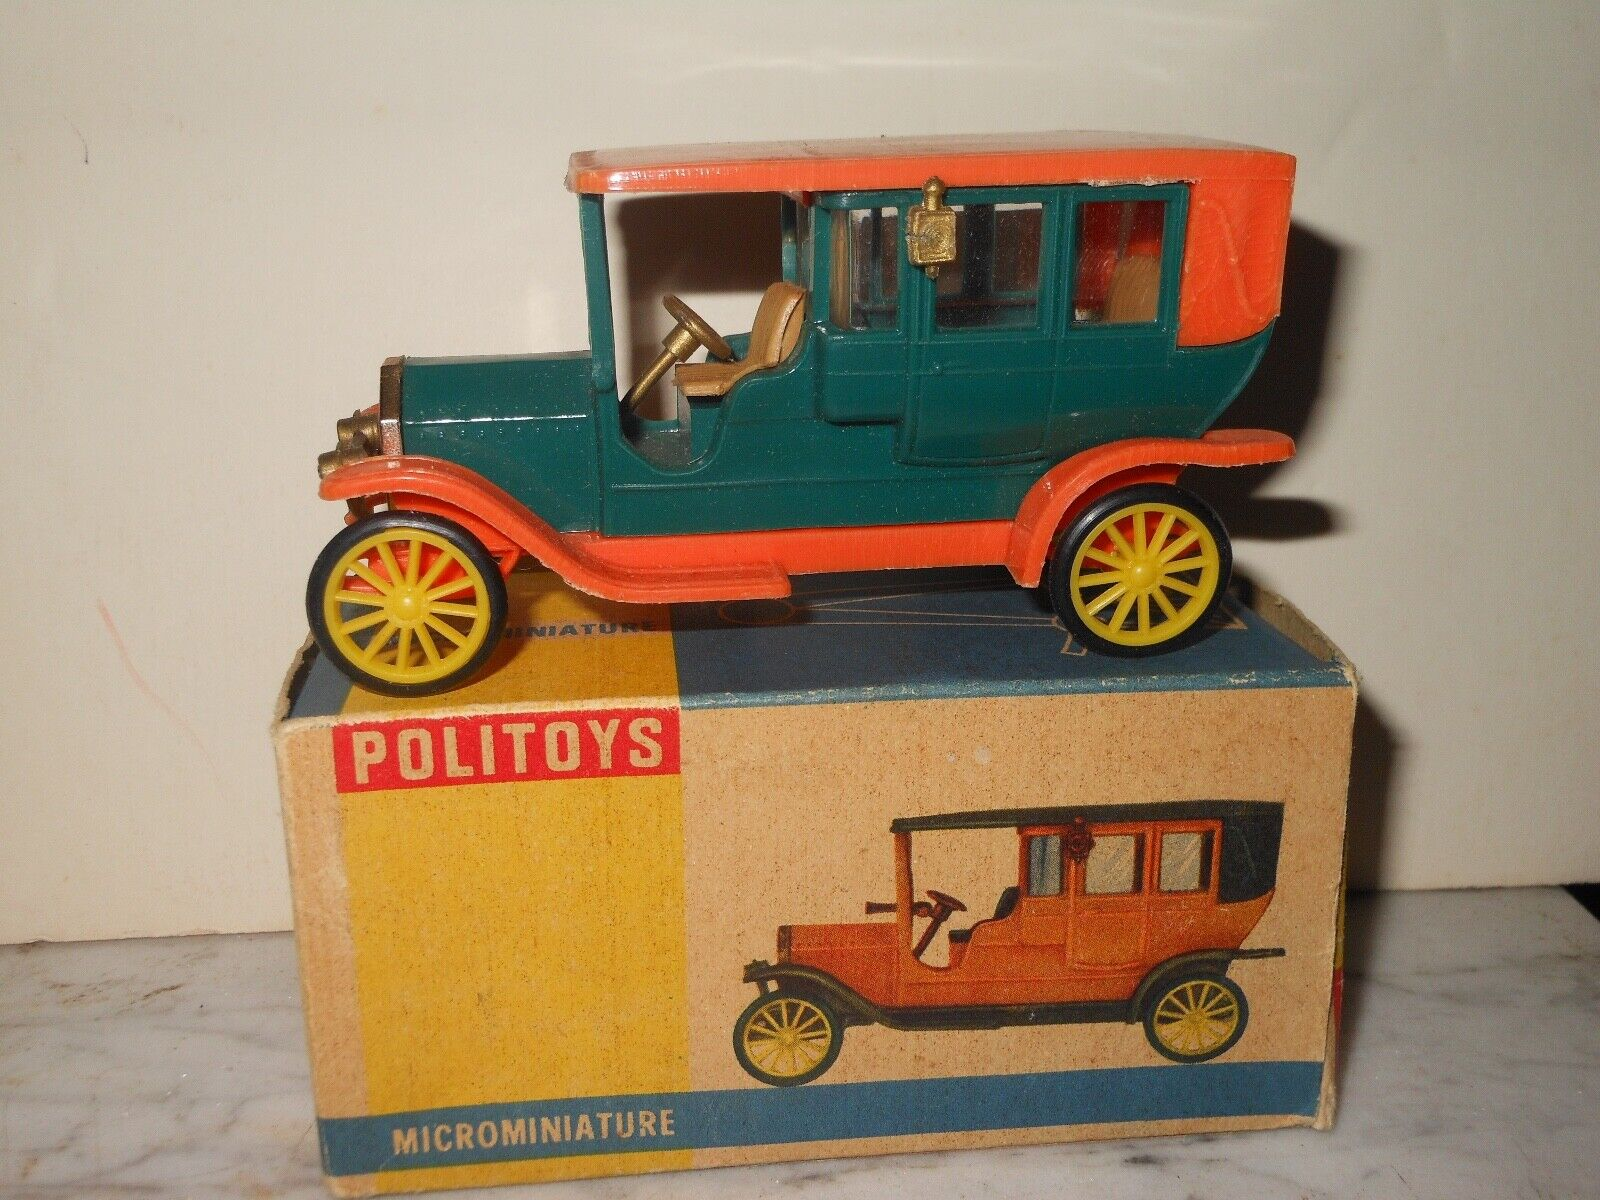 Microminiature Politoys 104 1 43 scale plastic 1909 Itala Palombell vintage toy